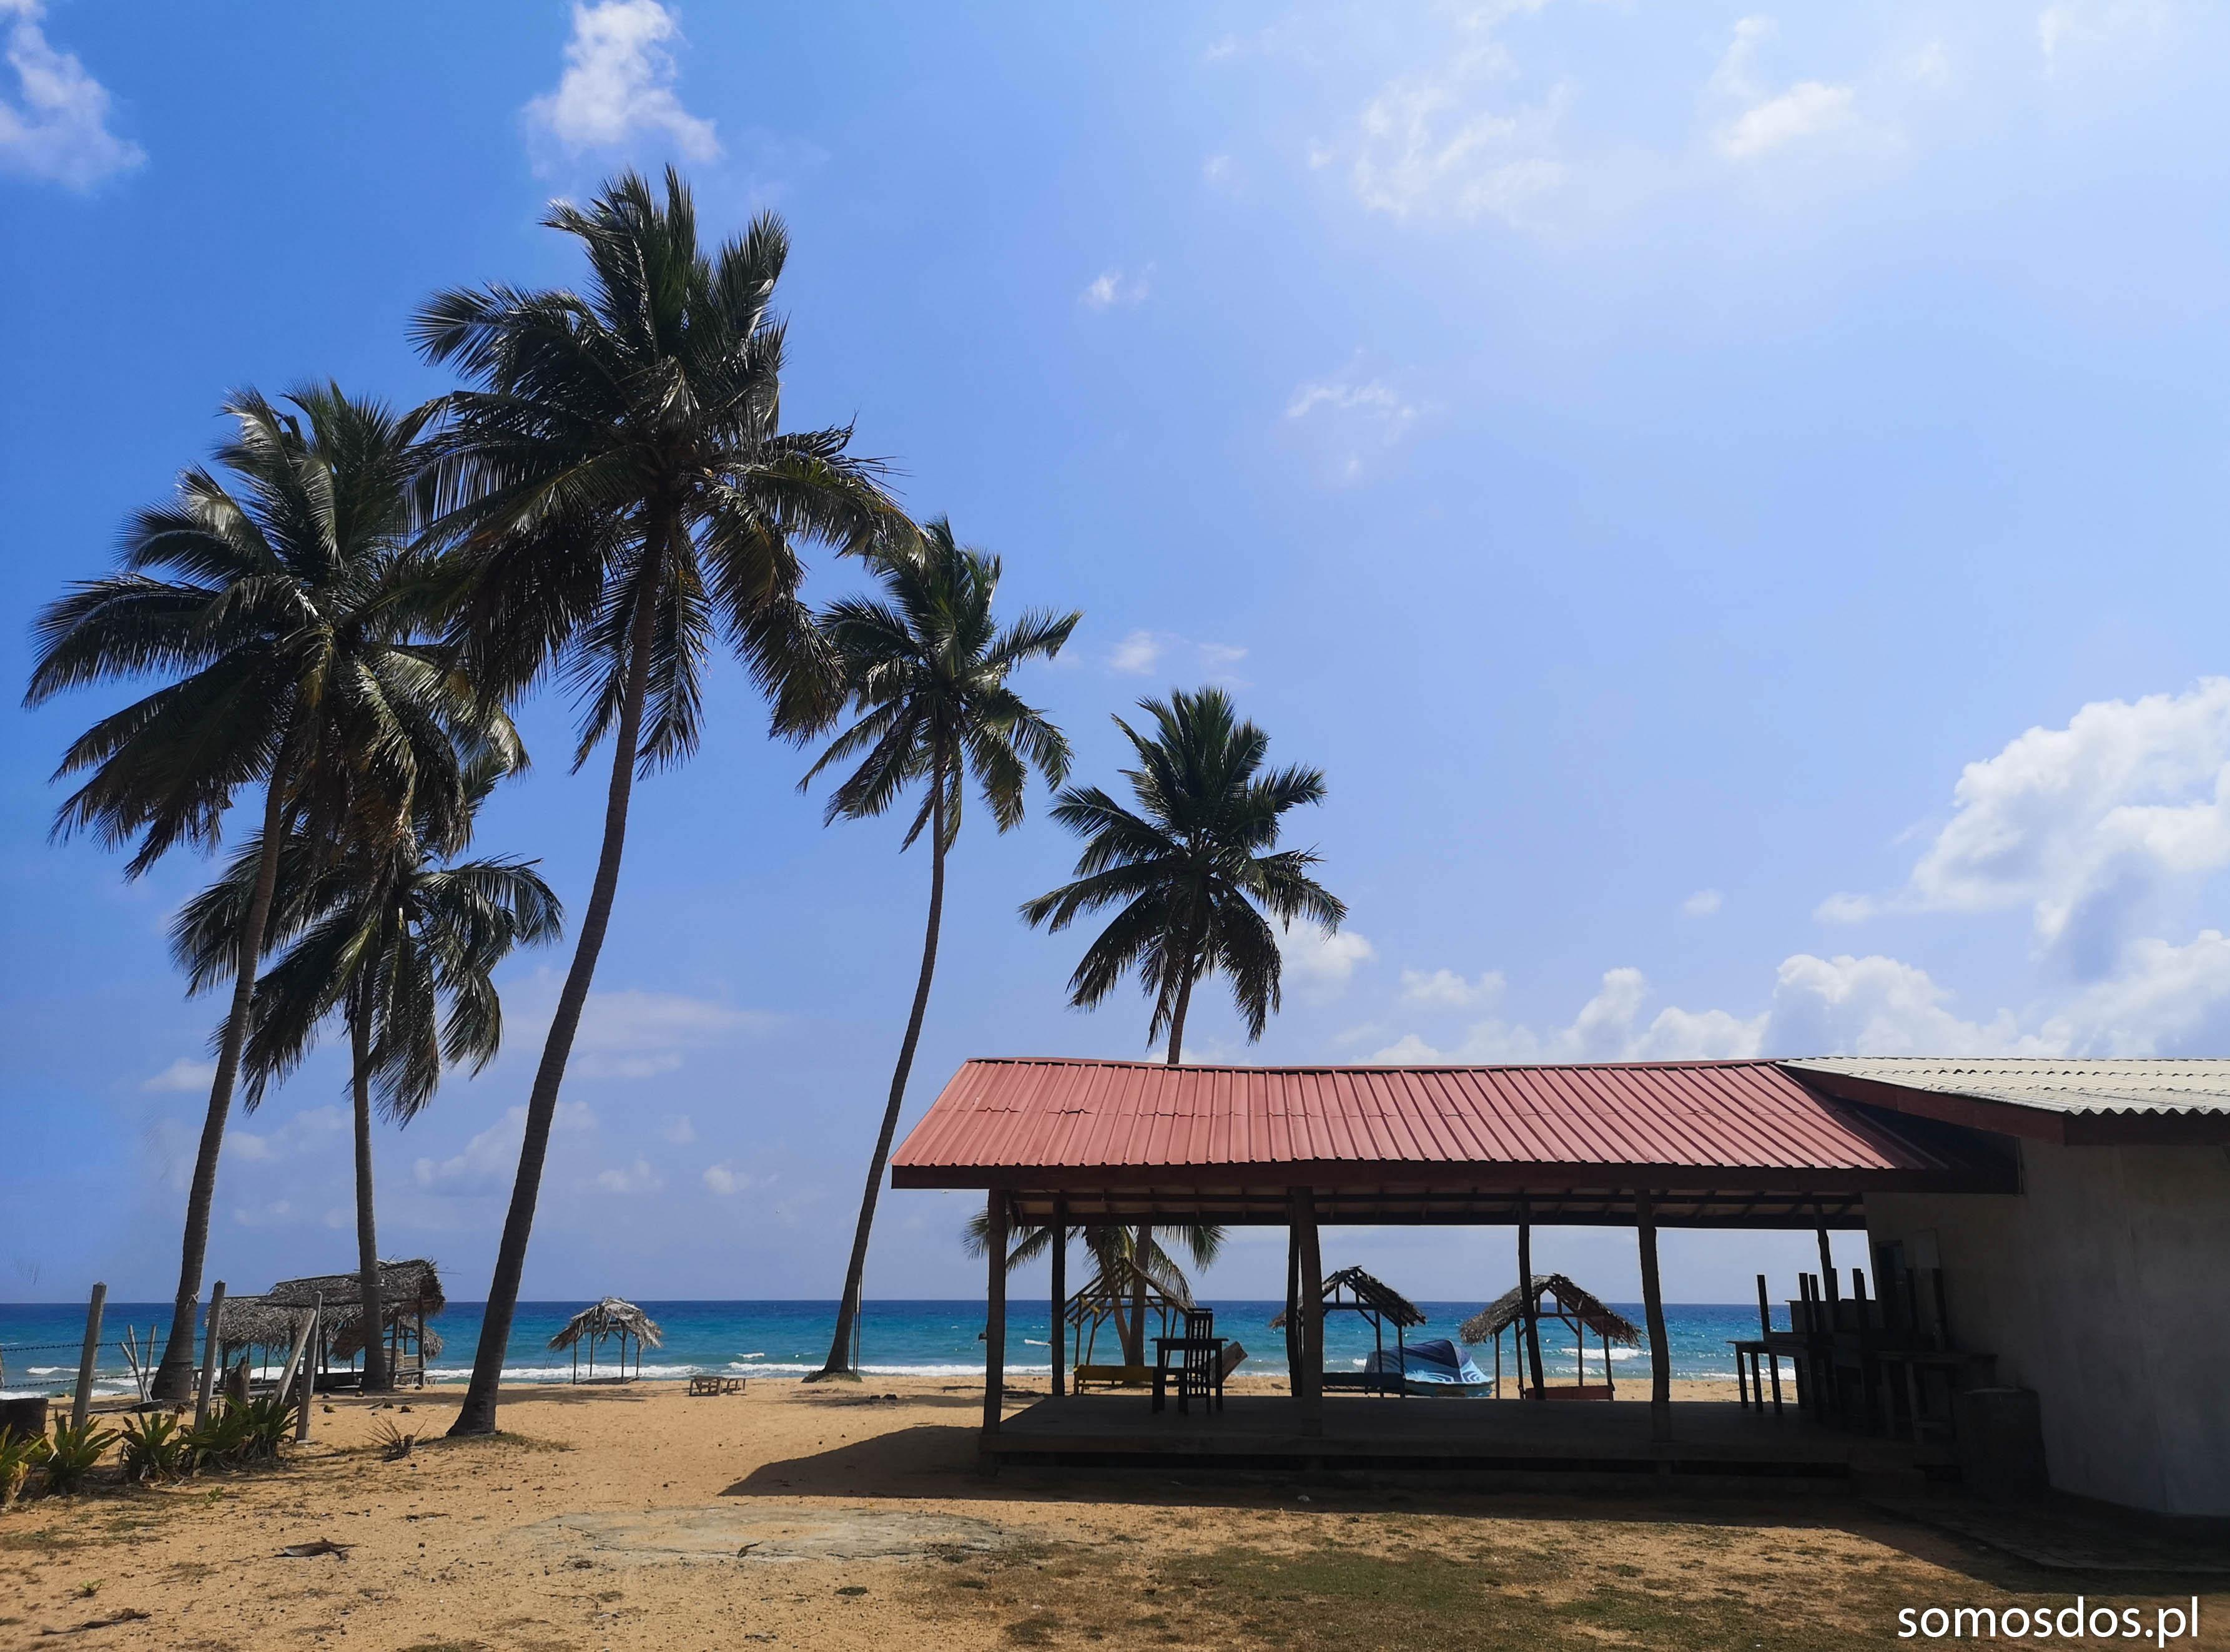 pigeon house hostel, nilaveli beach